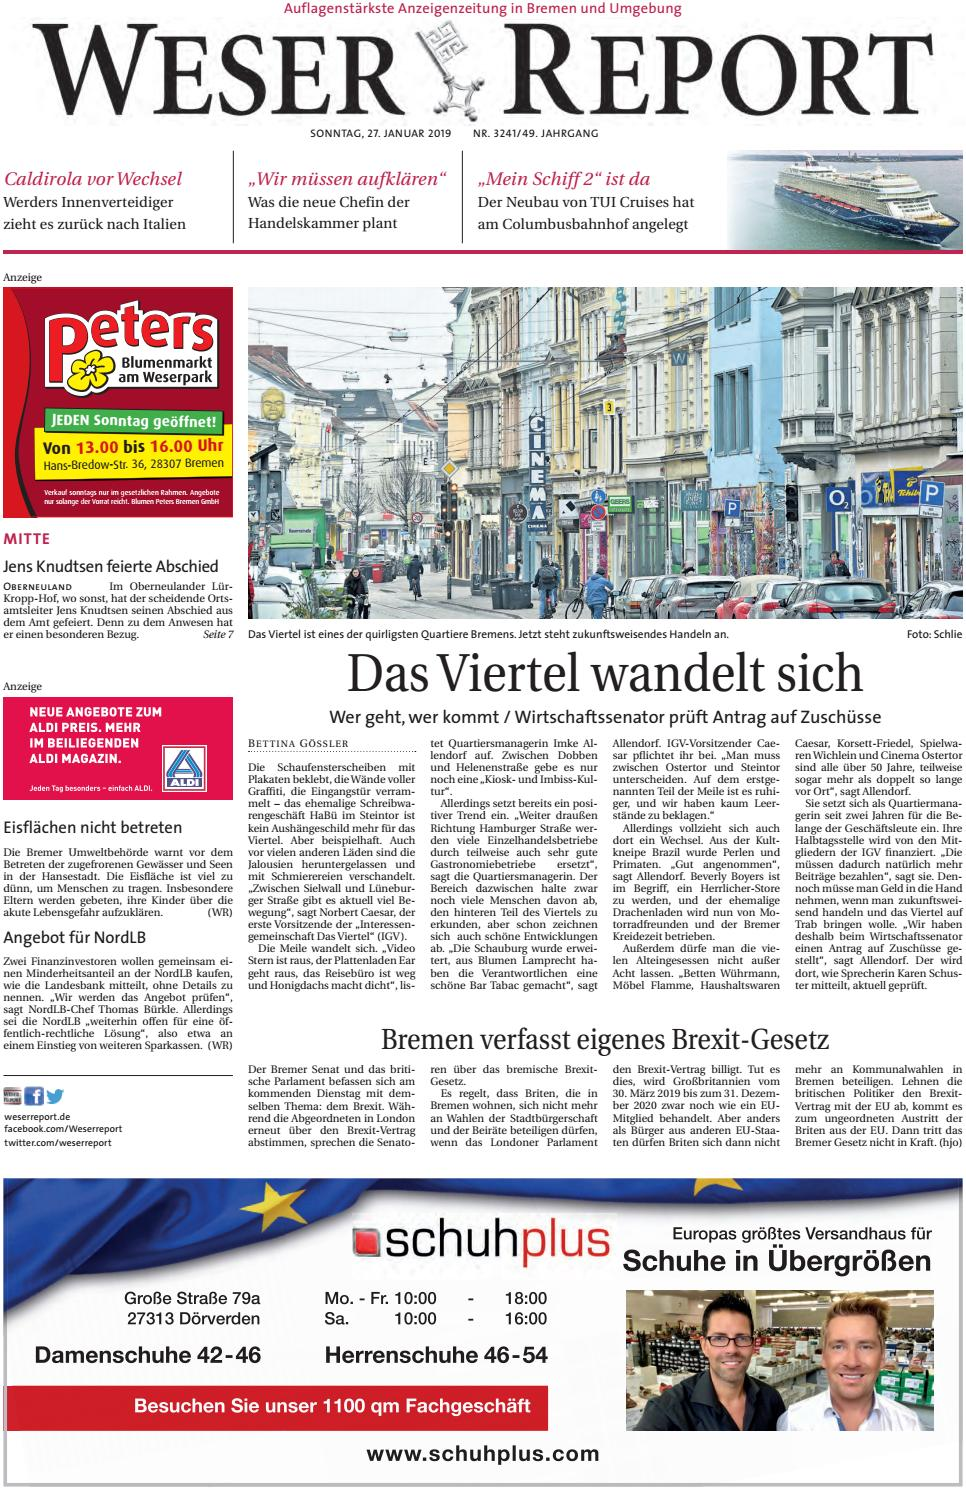 Weser Report Mitte vom 27.01.2019 by KPS